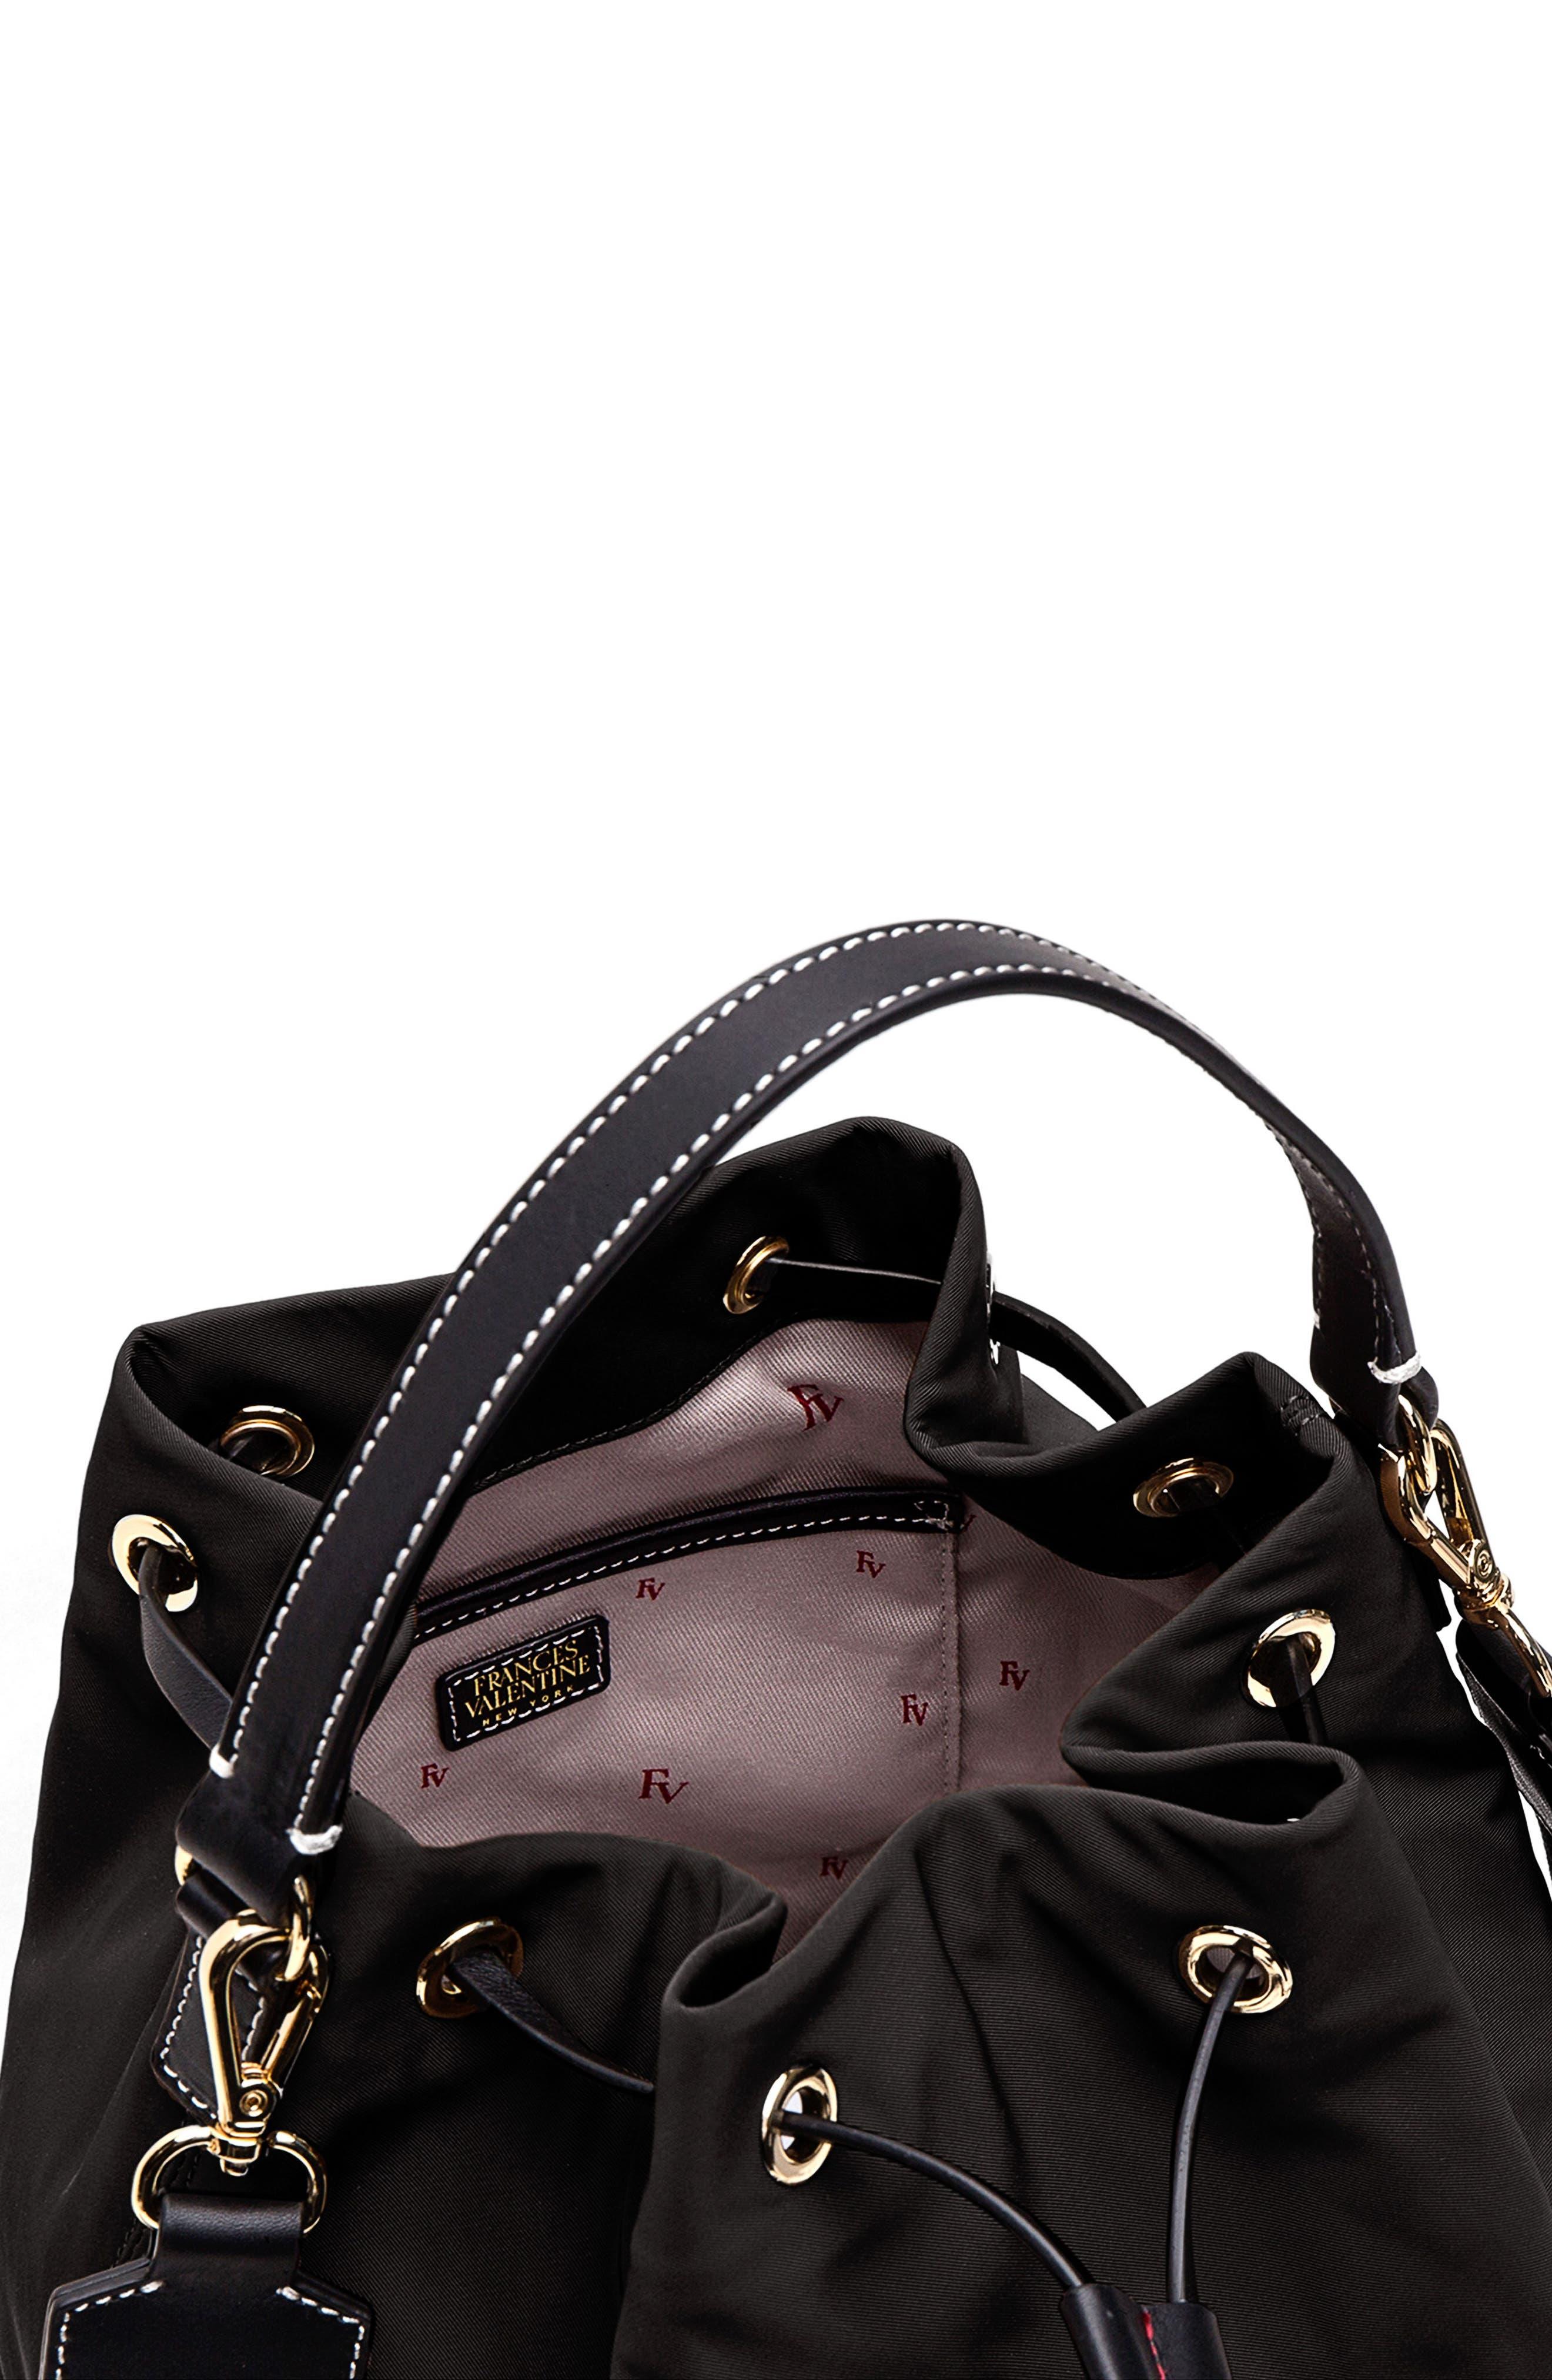 Medium Ann Nylon Bucket Bag,                             Alternate thumbnail 7, color,                             001